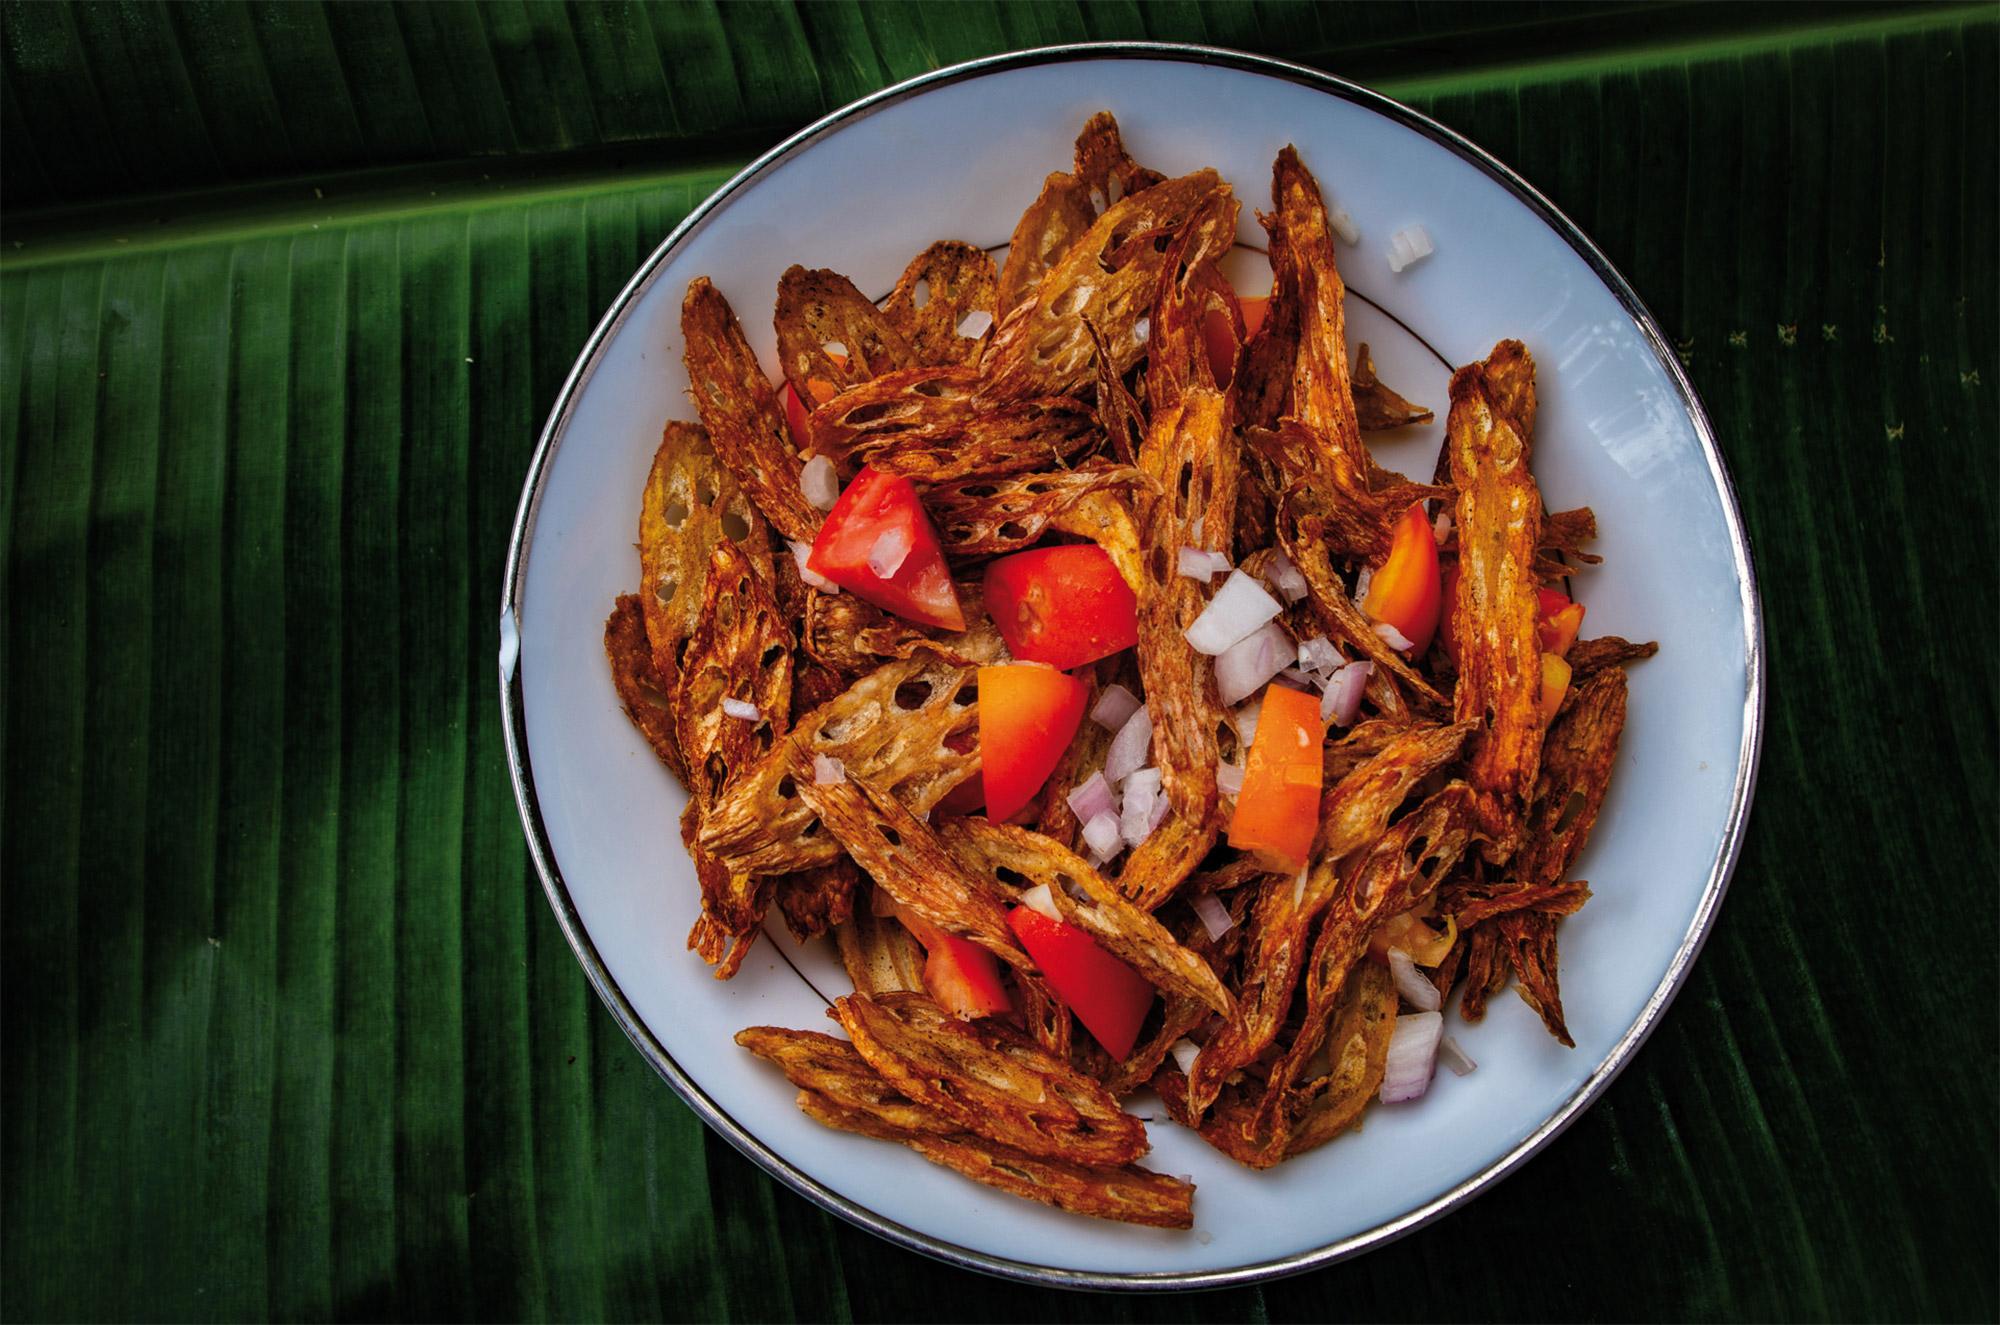 Lotuswurzel-Salat im Ayurveda Resort der one world foundation in Ahungalla, Sri Lanka, Foto: Ronald Jaklitsch